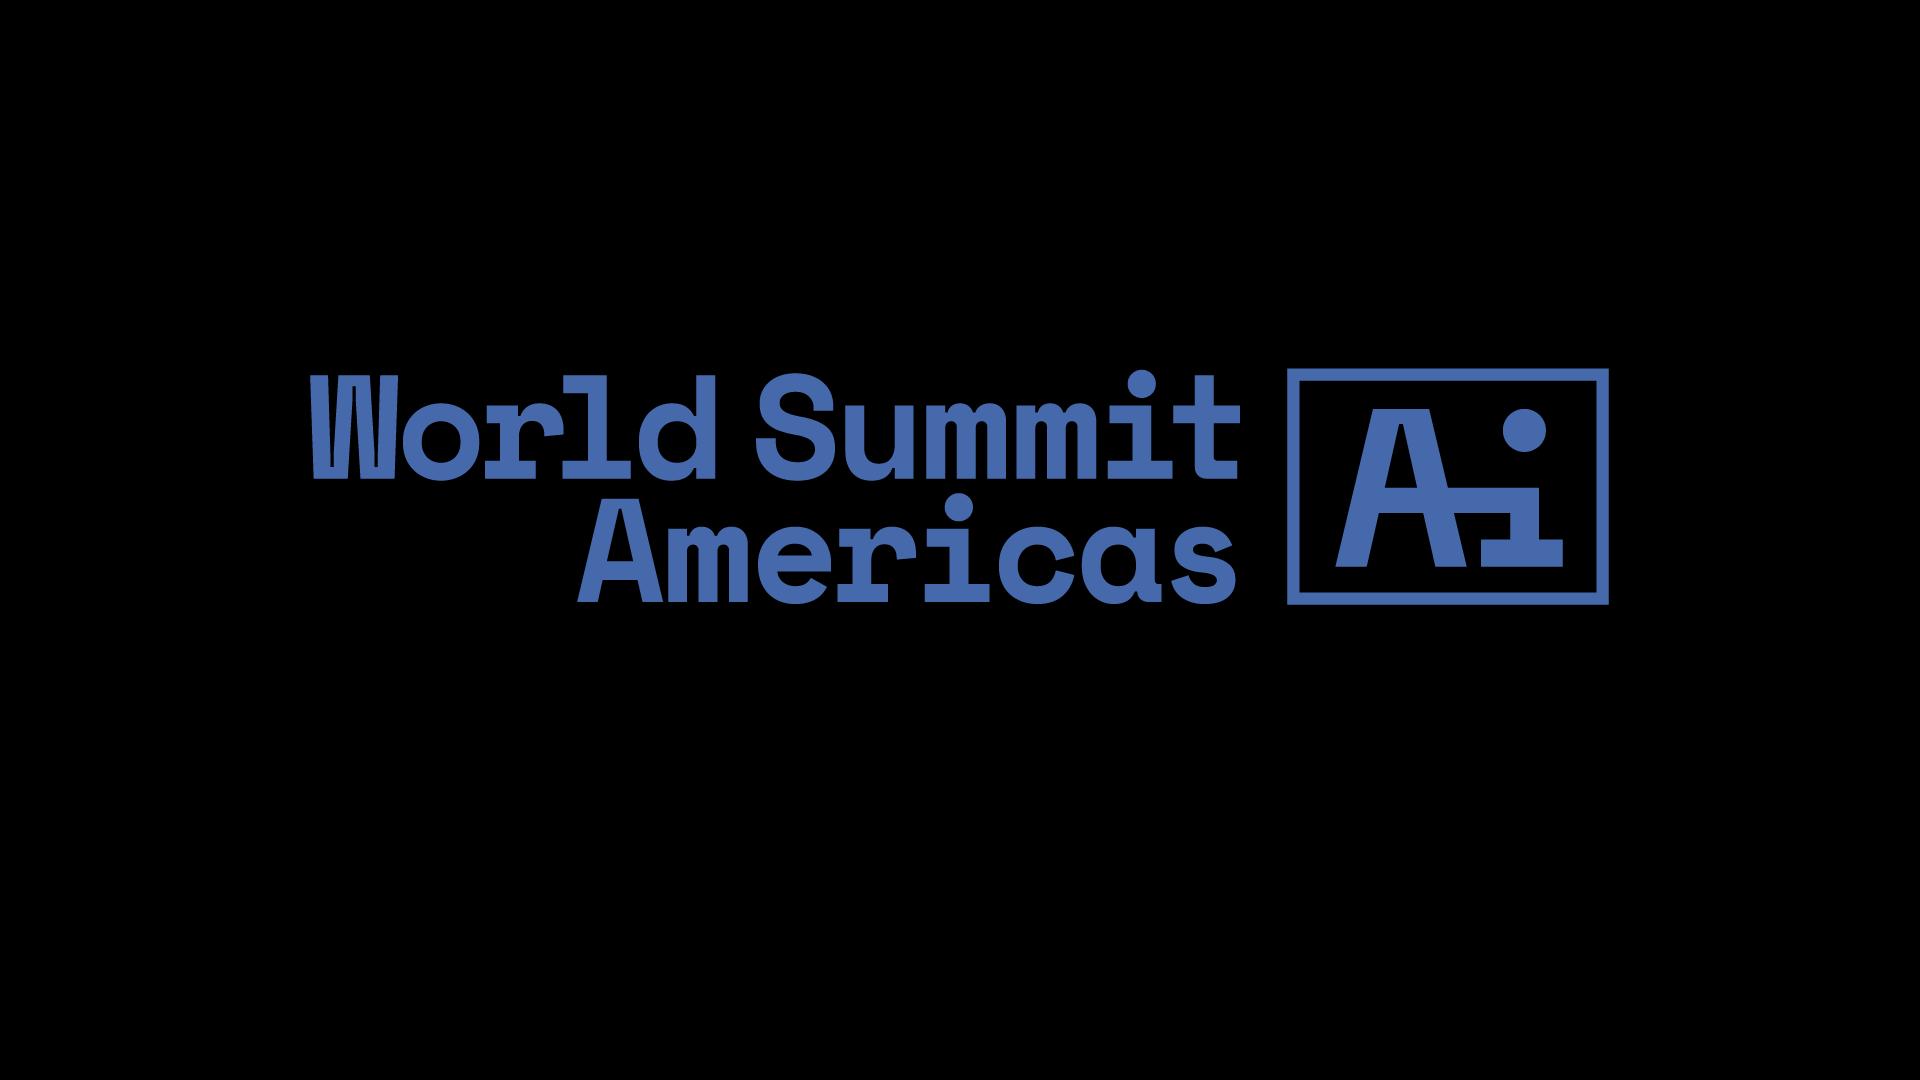 World Summit Americas